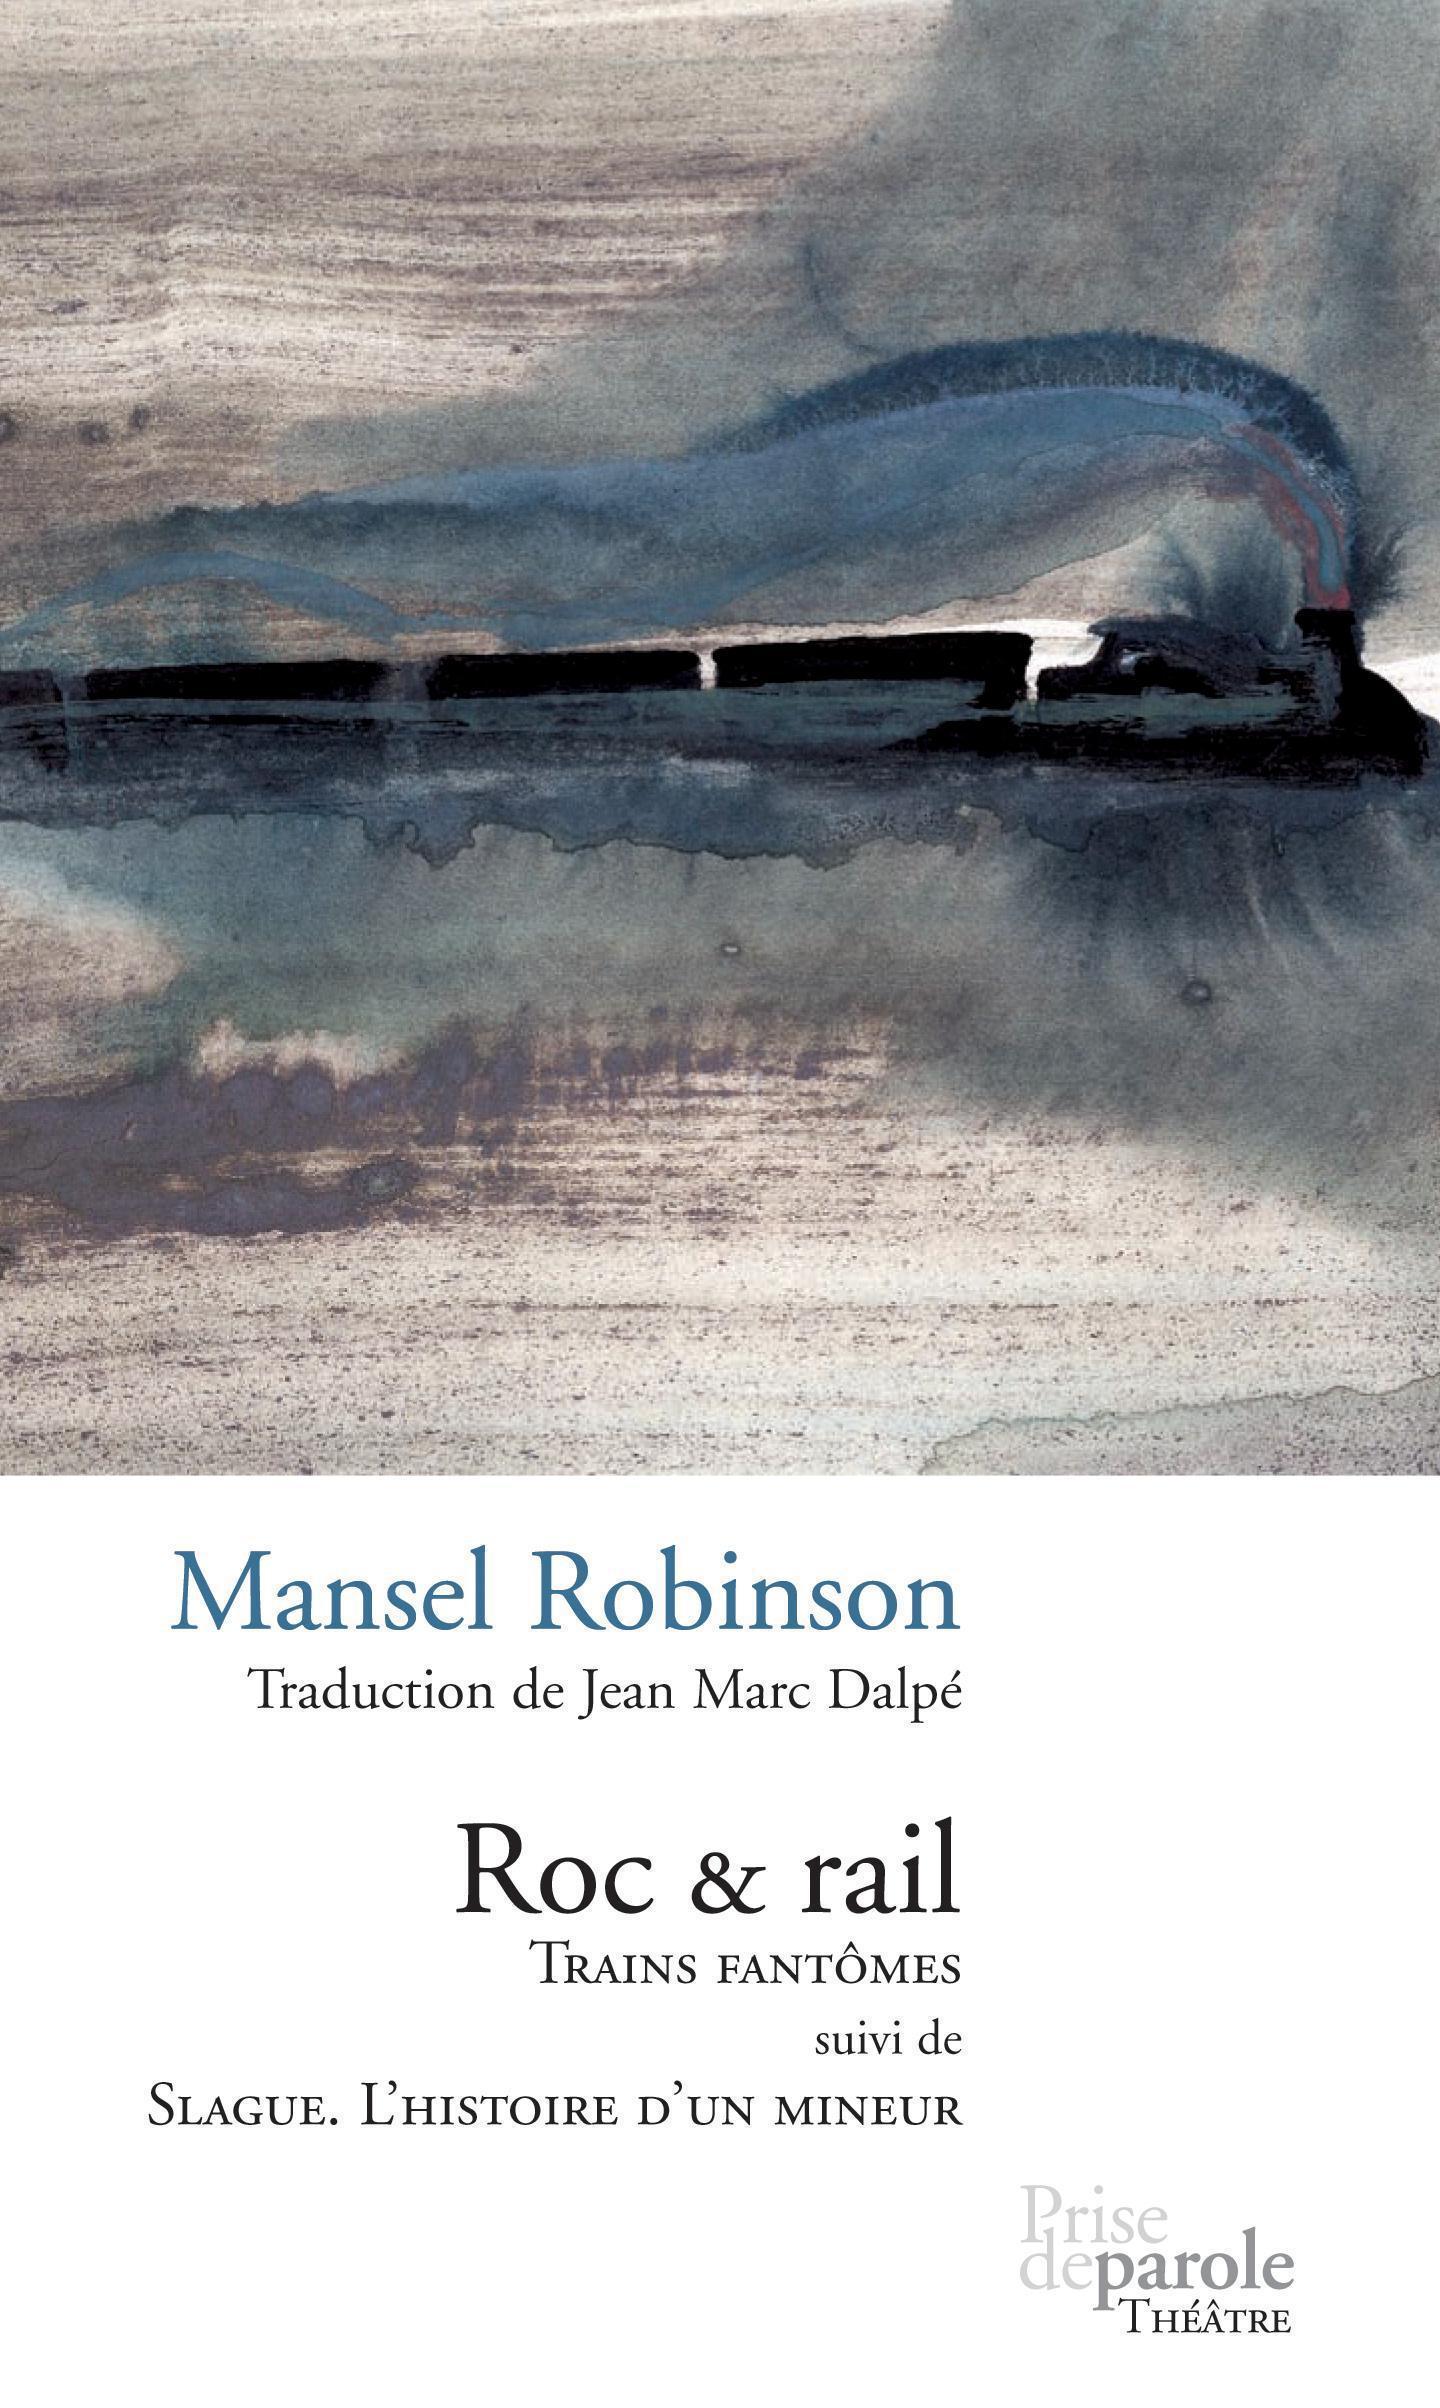 ROC & RAIL